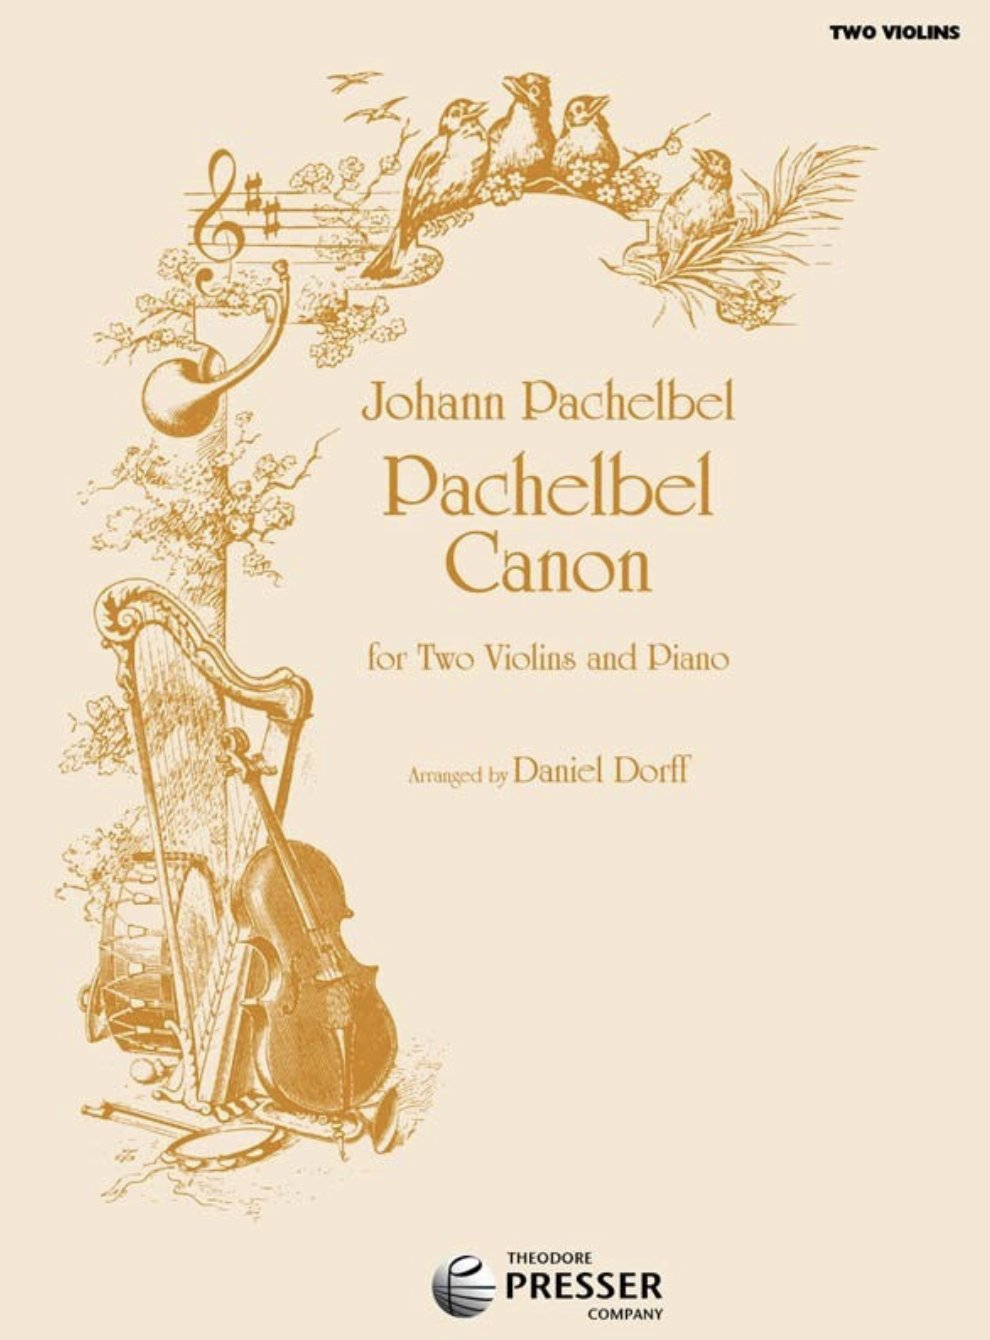 Canon - Pachelbel - Dorff - Violin Violin - Presser